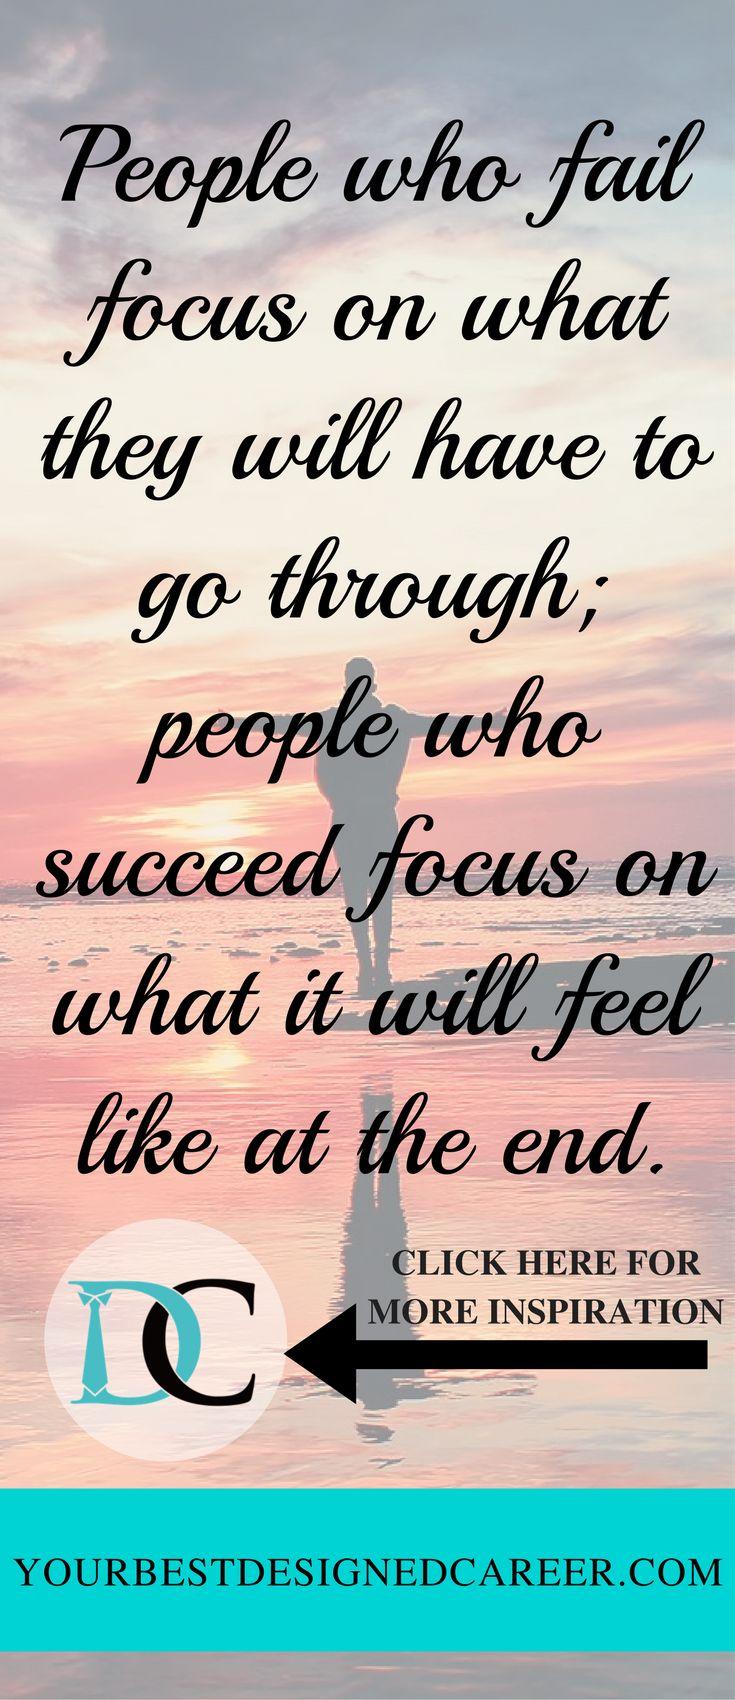 inspirational quotes, quotes, inspiration, career quotes, career change, motivation, motivational quotes, career, career advice,